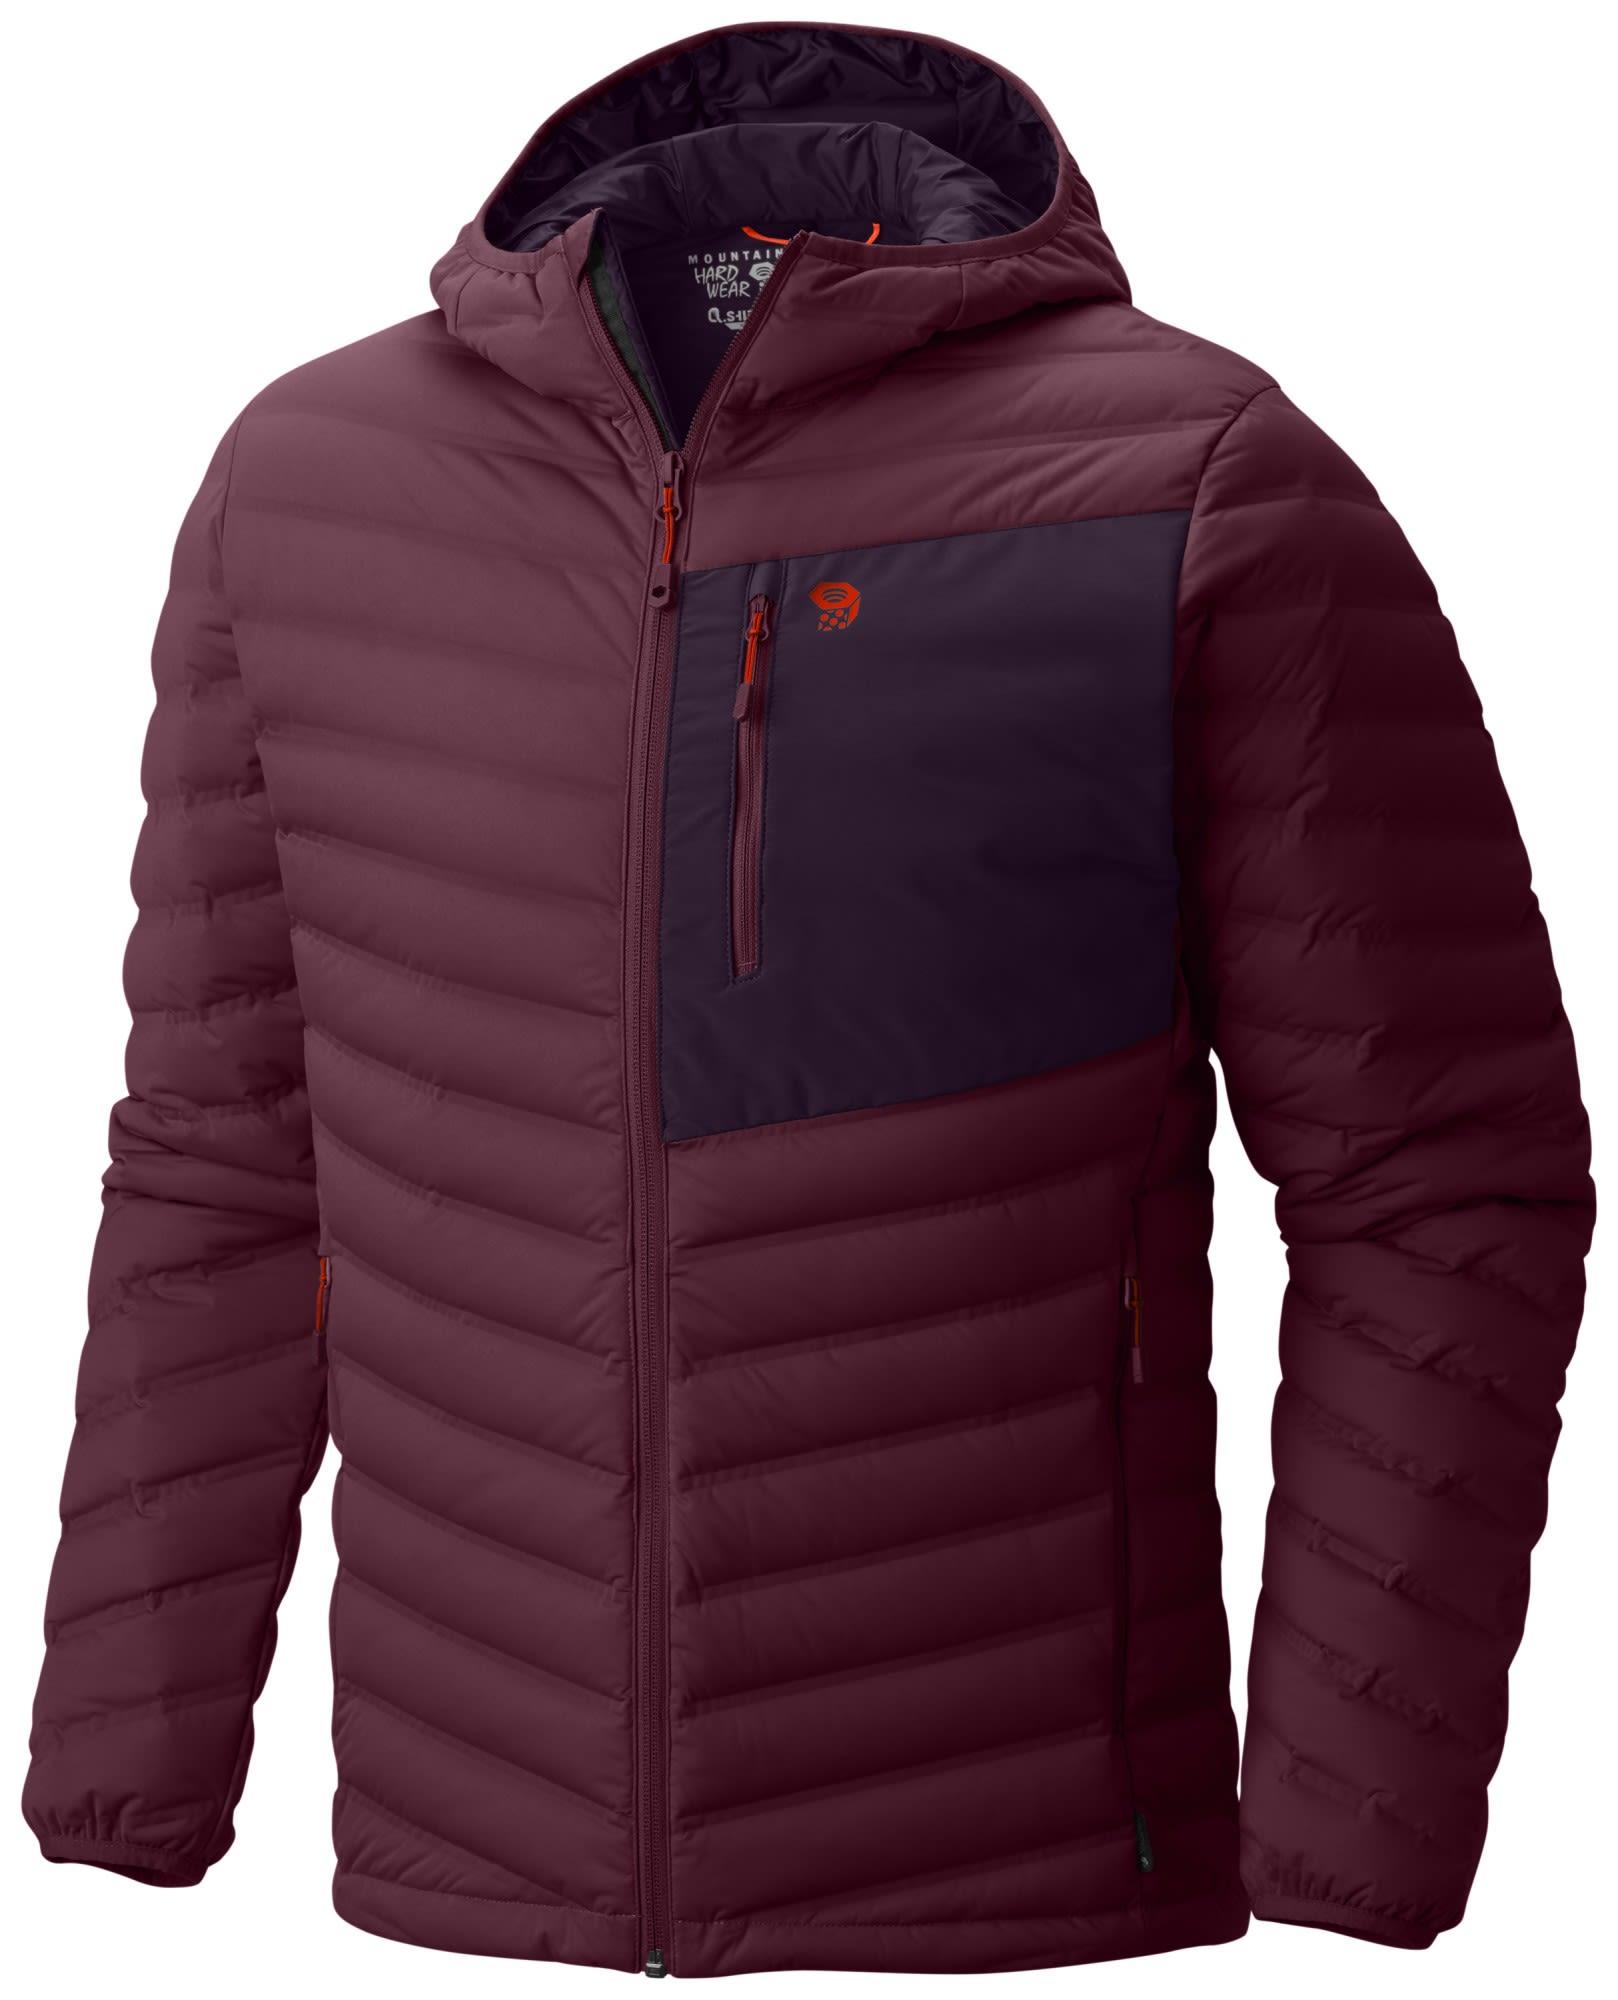 Mountain Hardwear Daunenjacken Online Shops | OutdoorDeals